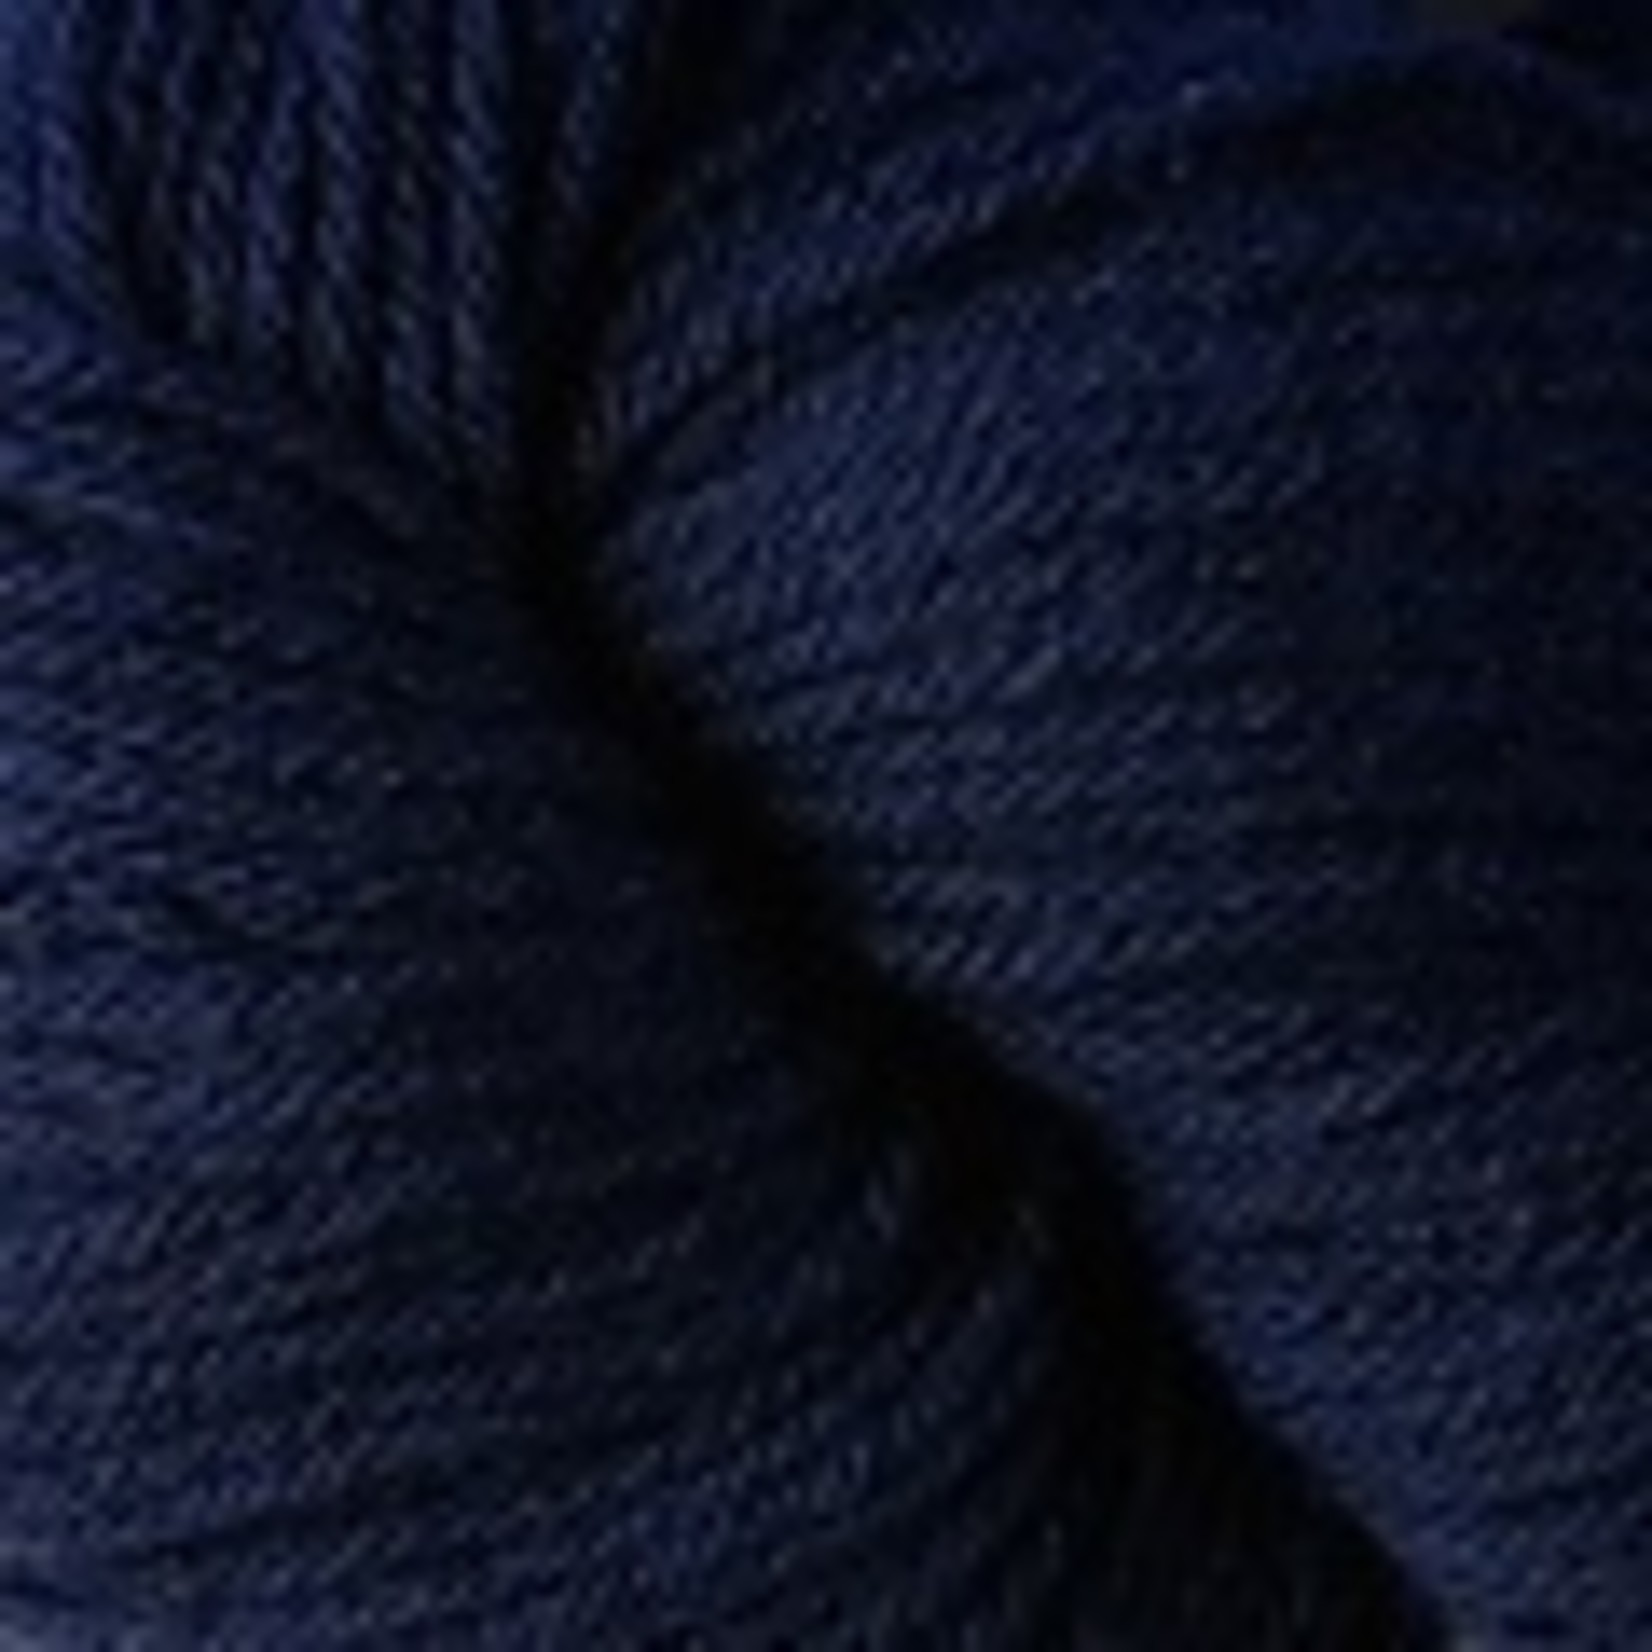 Berroco Vintage Wool, 5143, Dark Denim